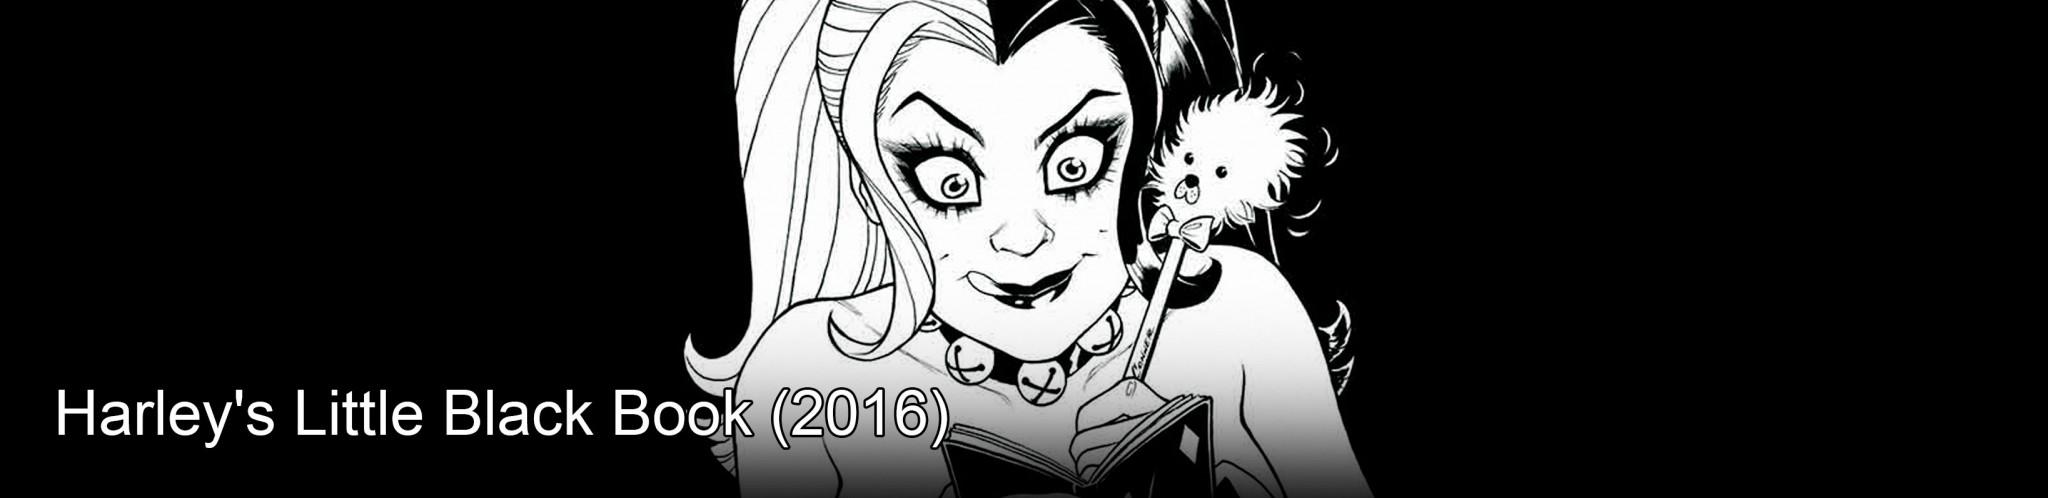 Harley's-Little-Black-Book